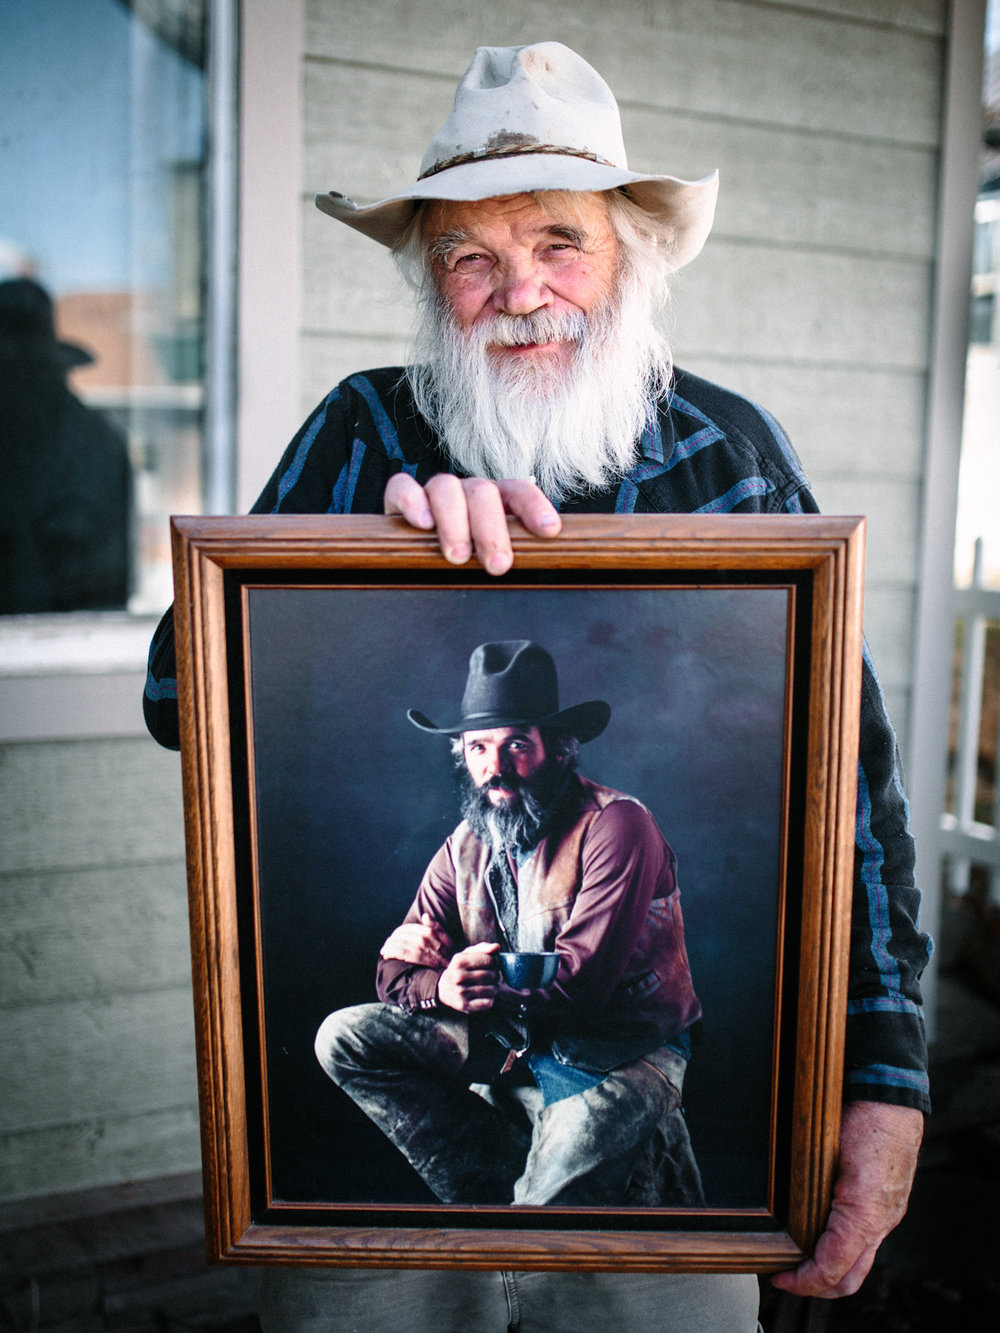 TY-HARDIN-AMERICAN-PHOTOGRAPHER-17.JPG